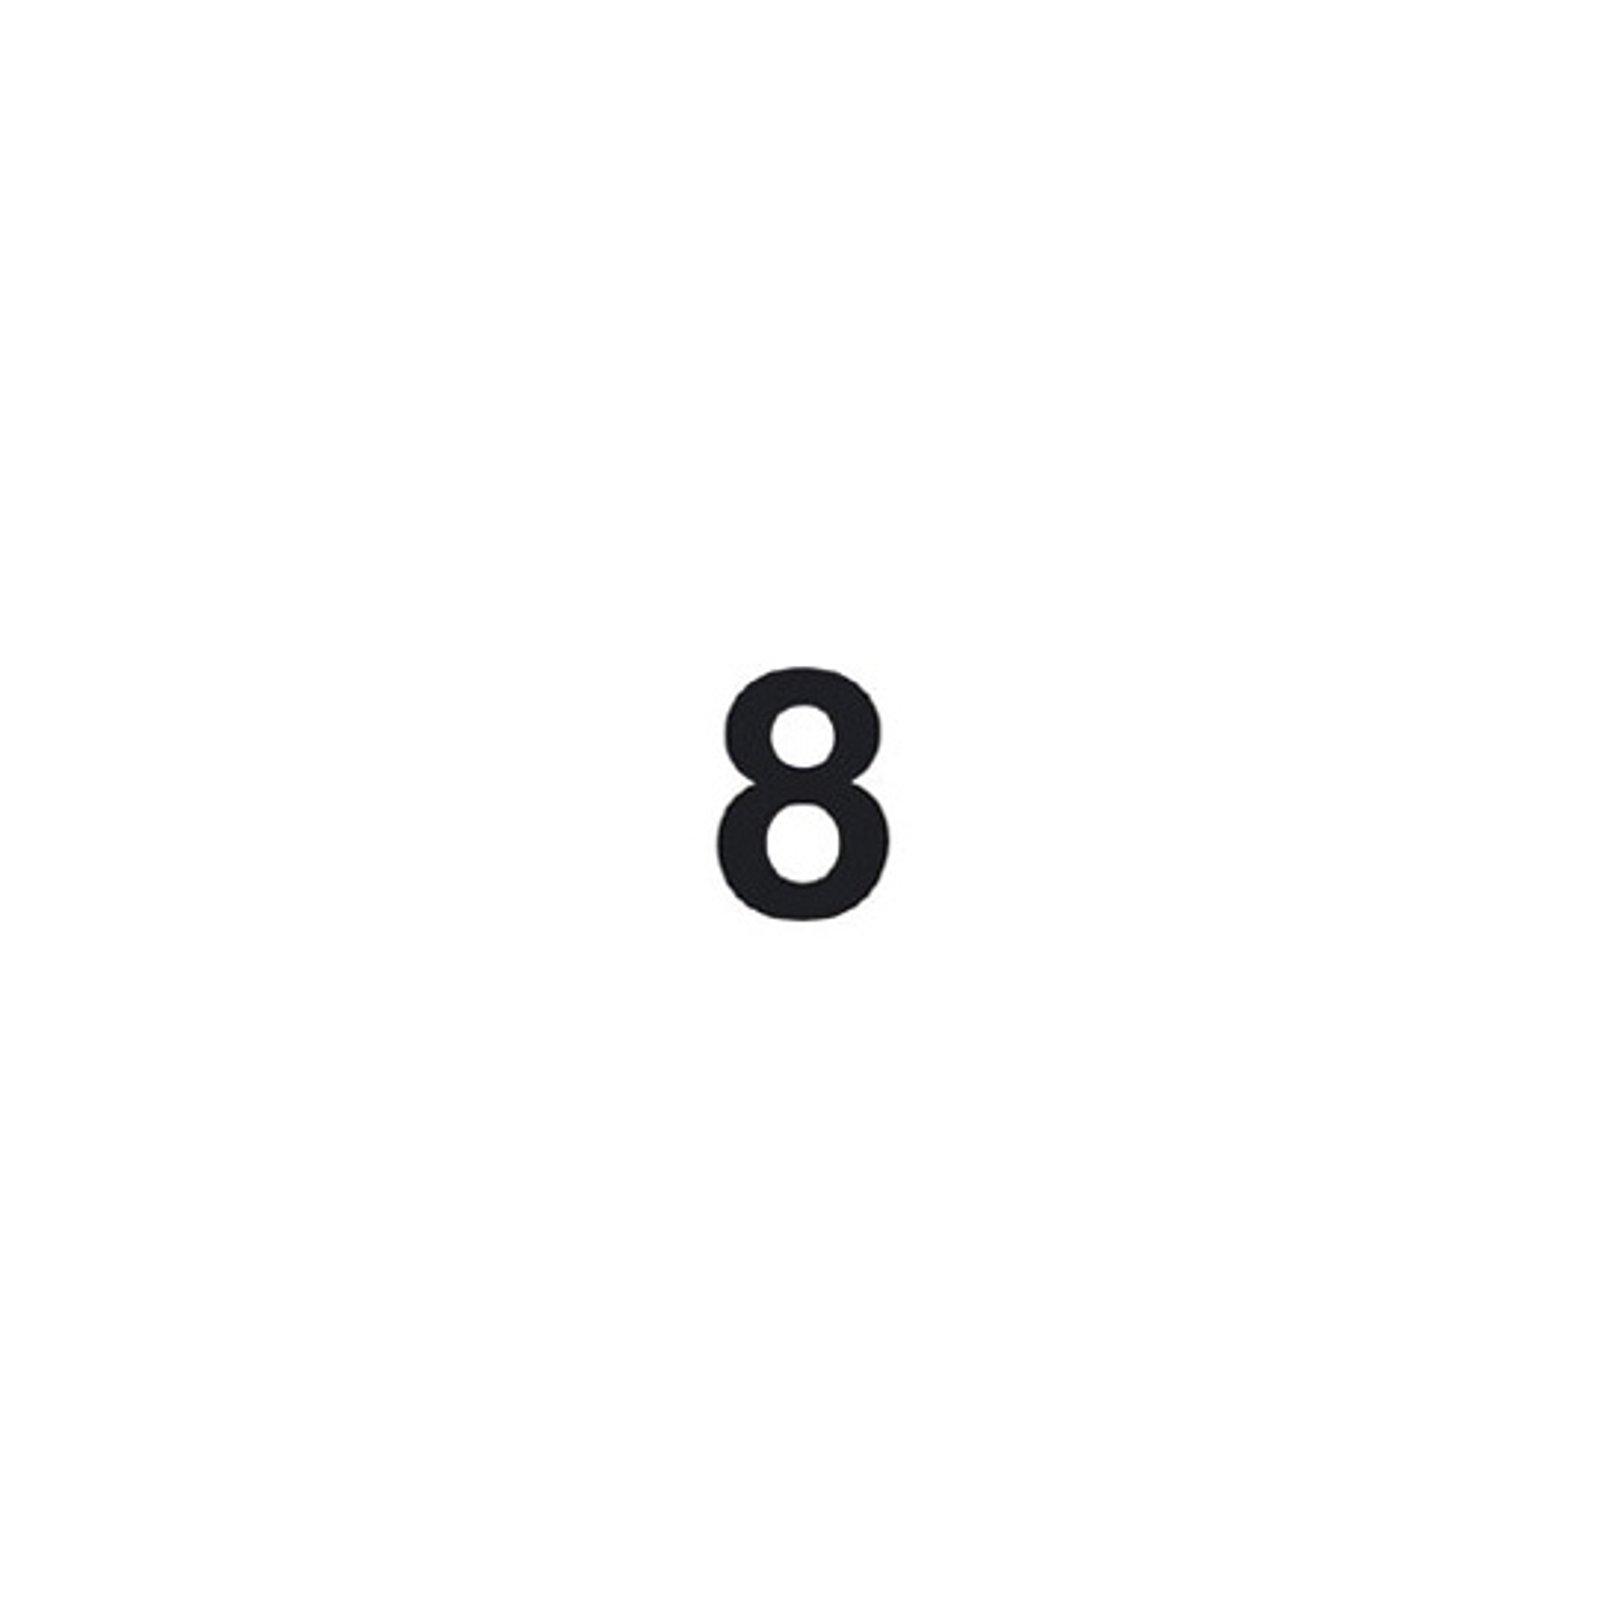 Selvklebende tallet 8